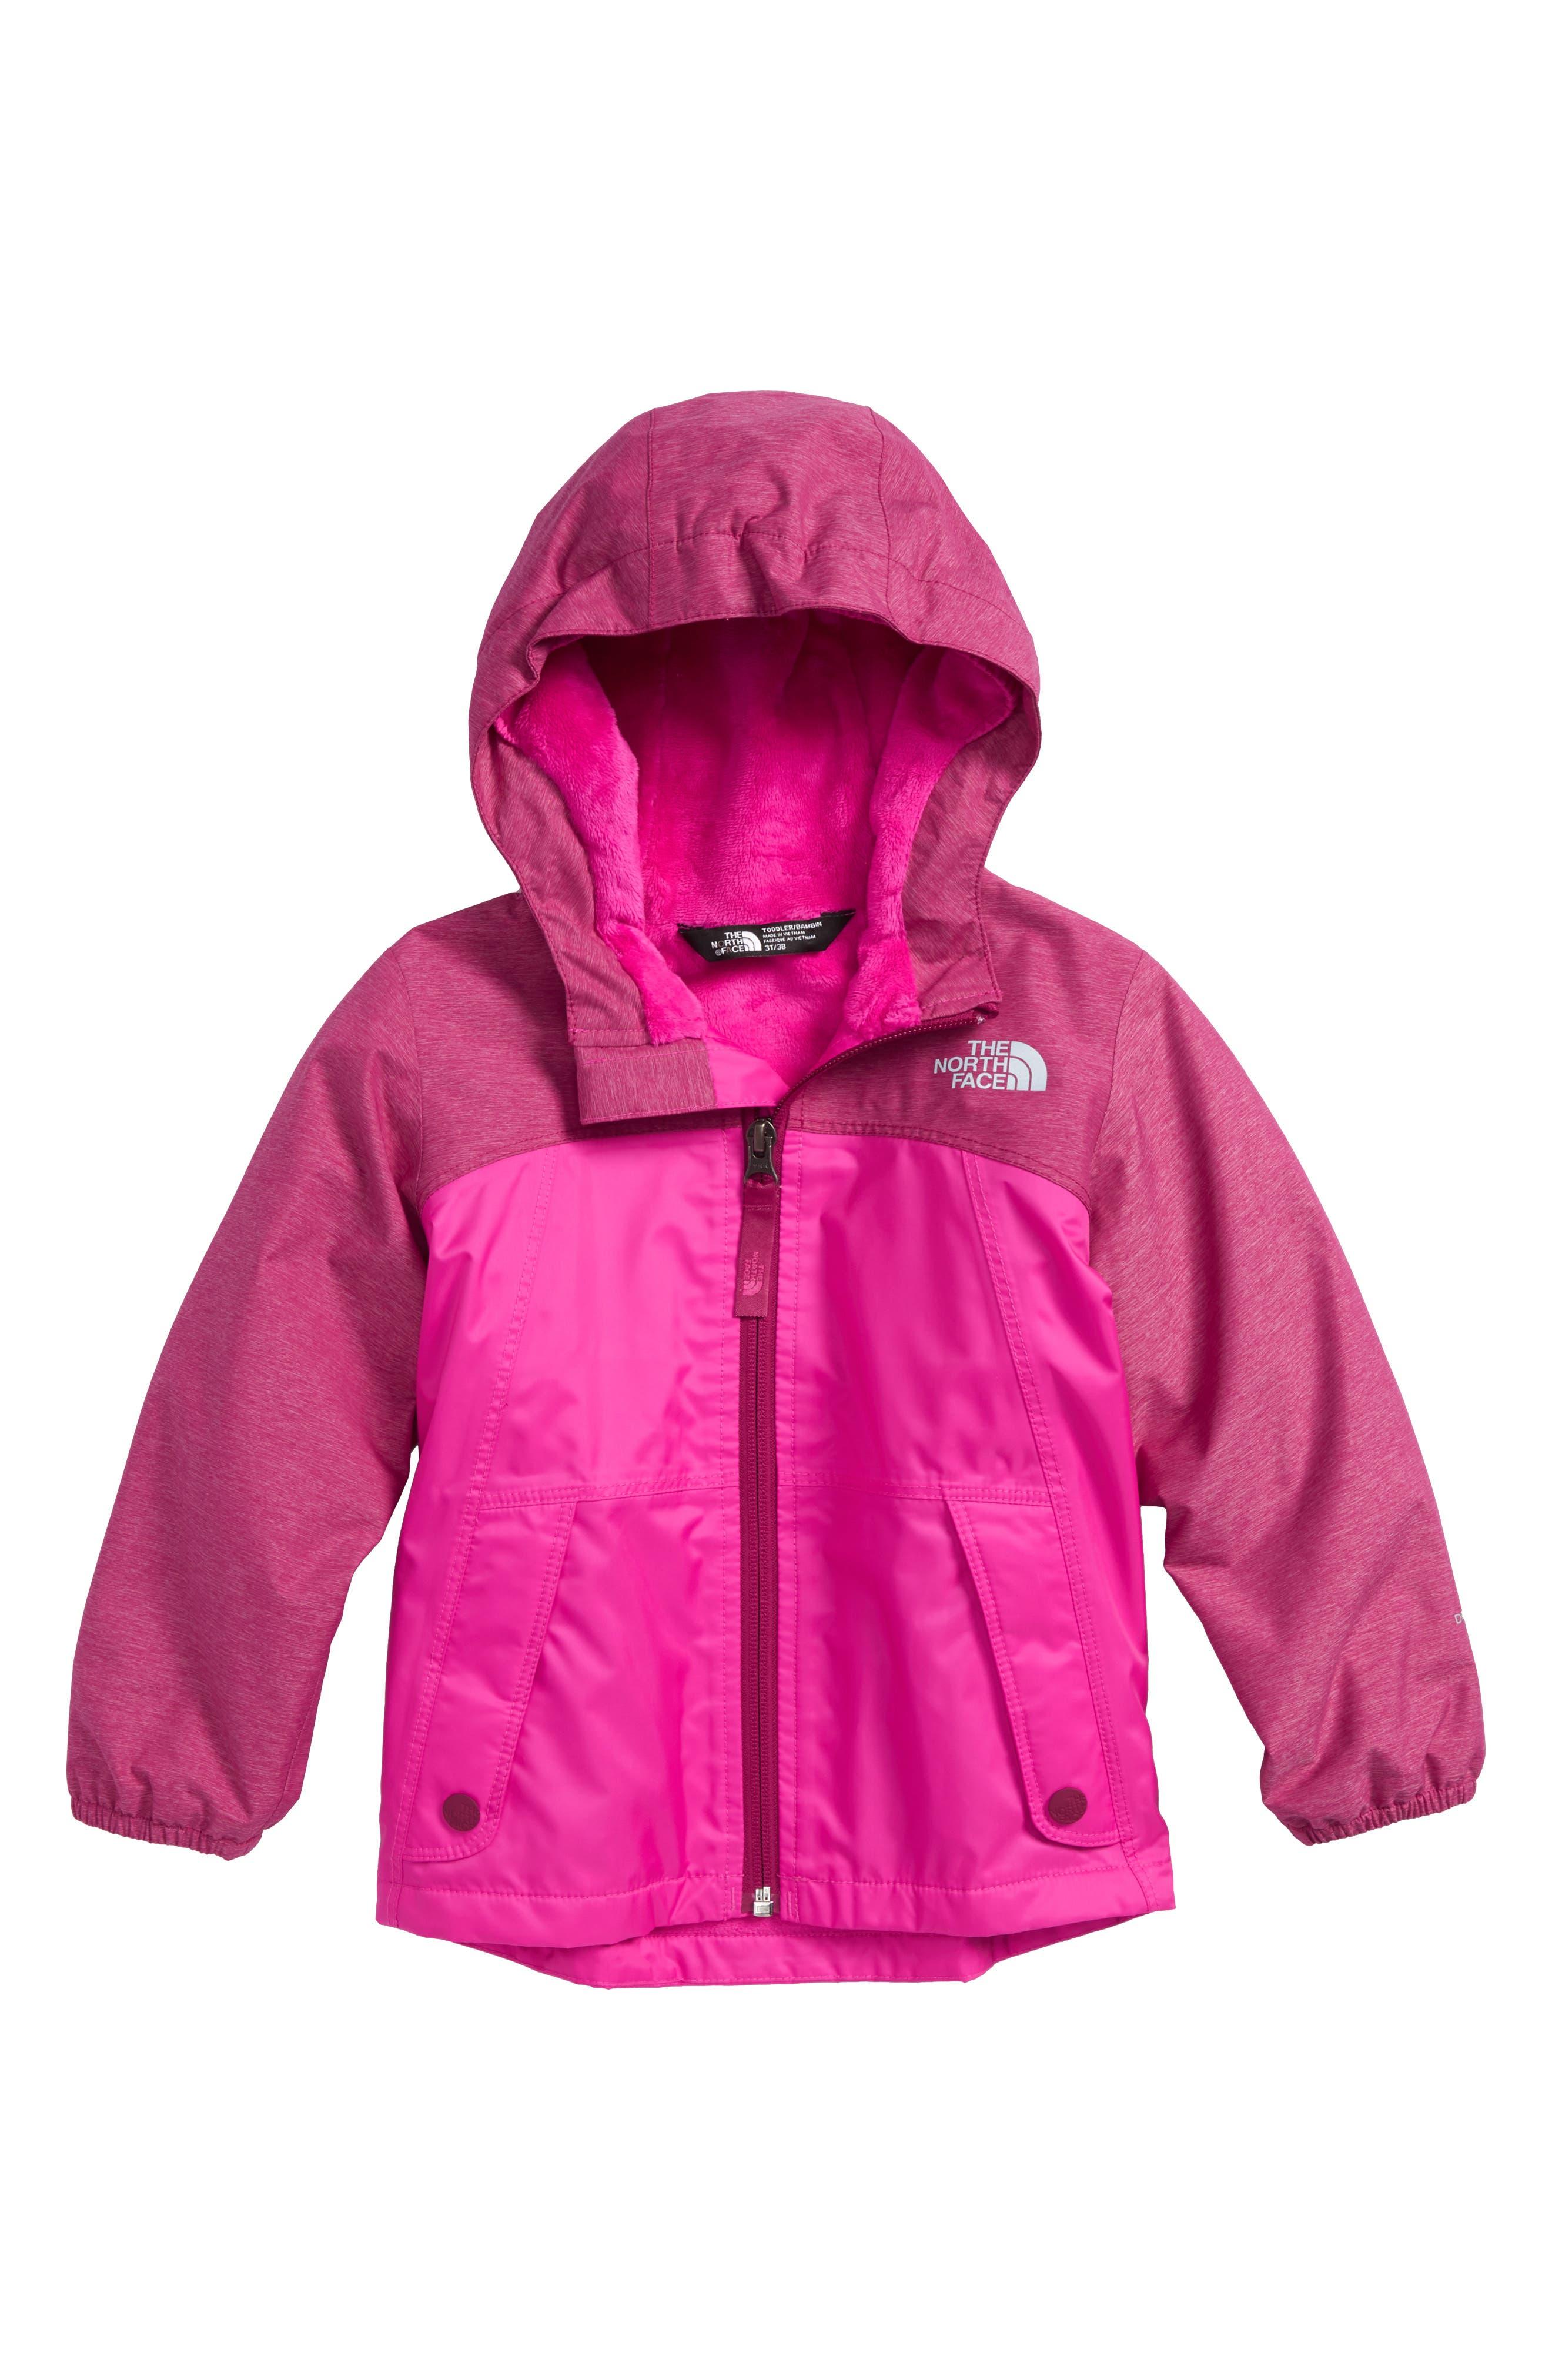 Warm Storm Waterproof Jacket,                         Main,                         color, DRAMATIC PLUM HEATHER